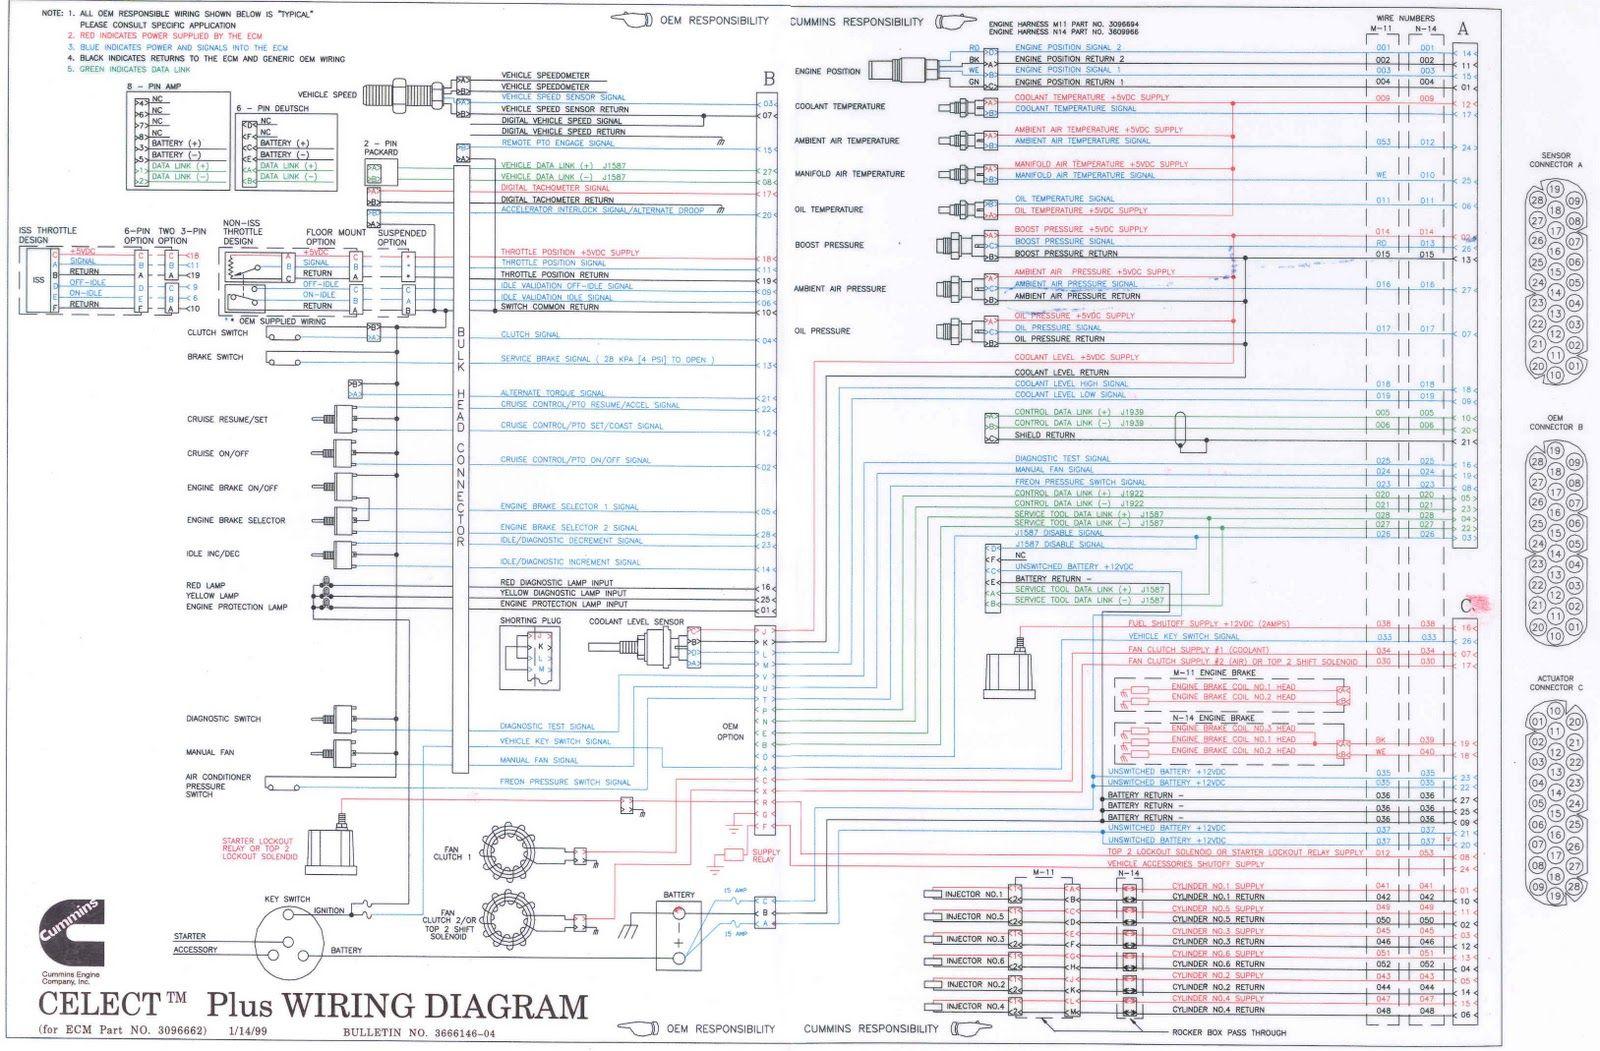 cummins n14 celect plus wiring diagram mercedes benz w203 diagrams beautiful ecm pictures inspiration andbeautiful